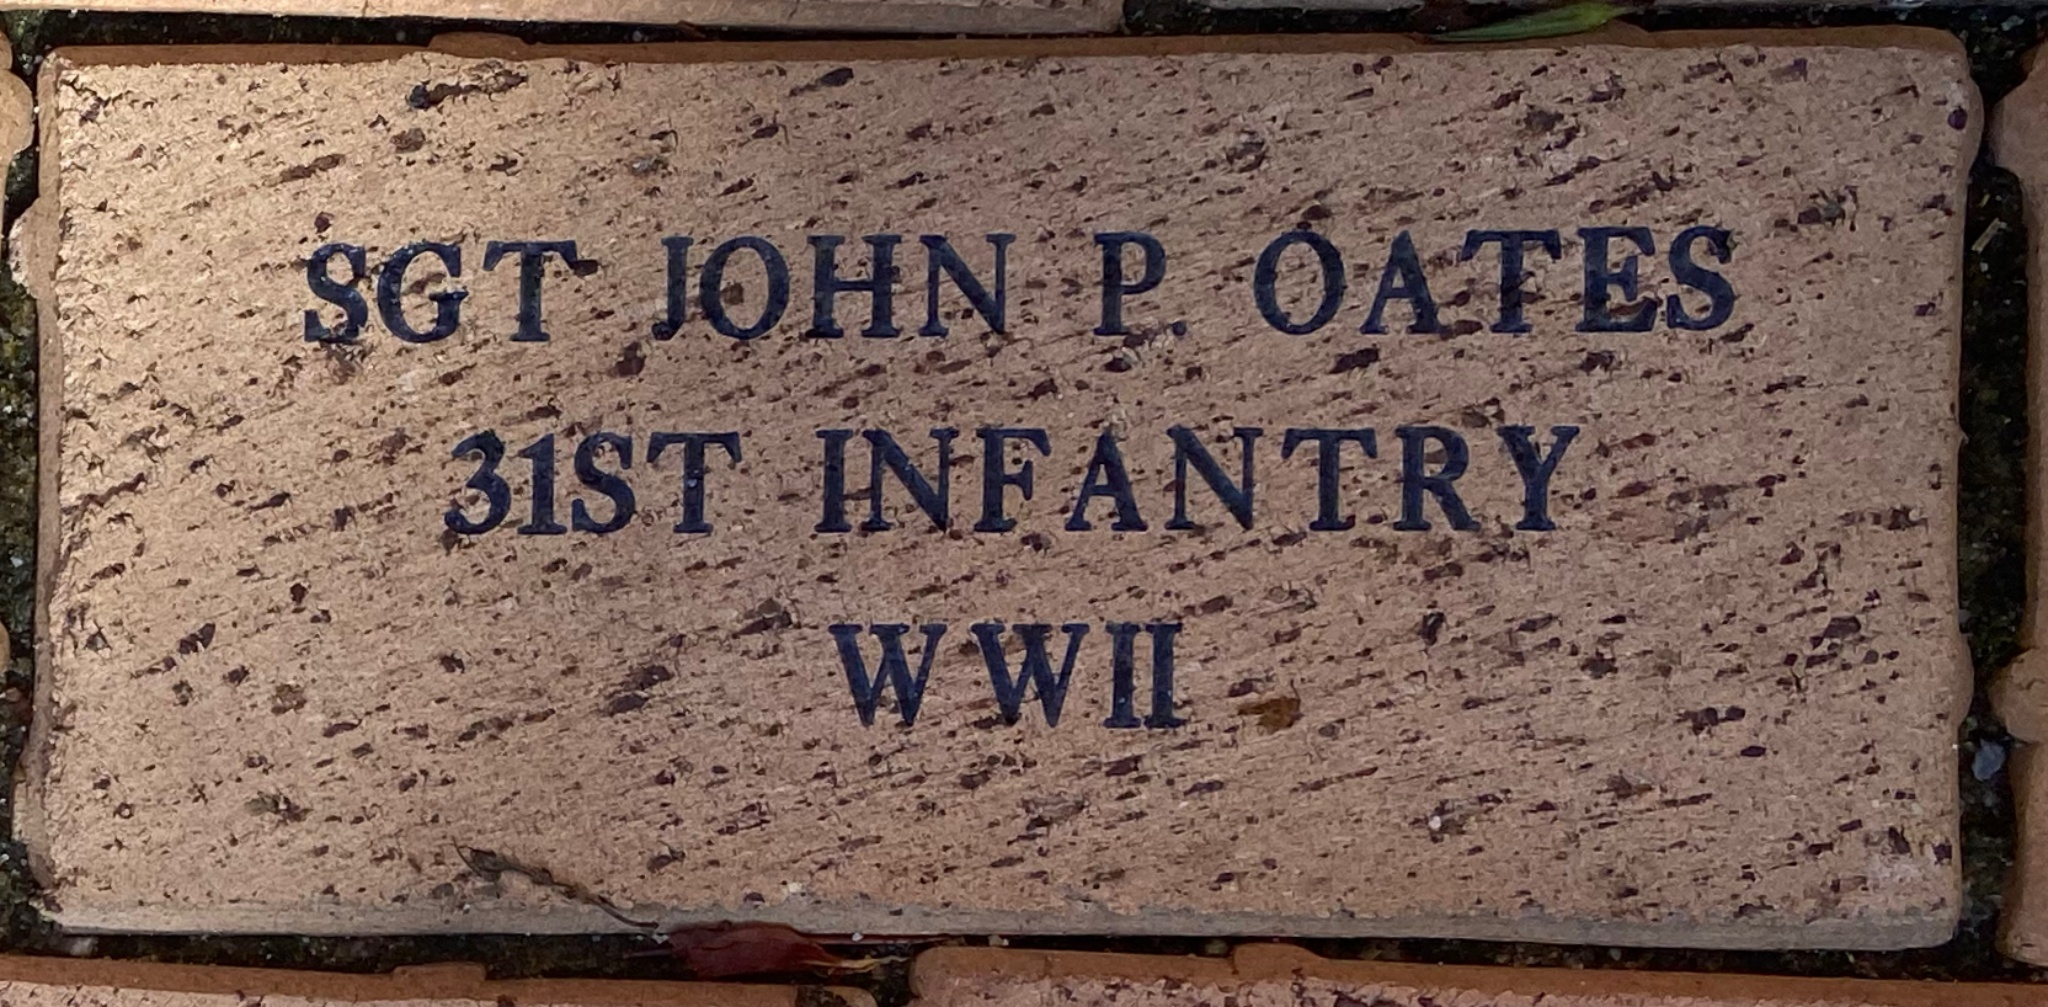 SGT JOHN P. OATES 31ST INFANTRY WWII